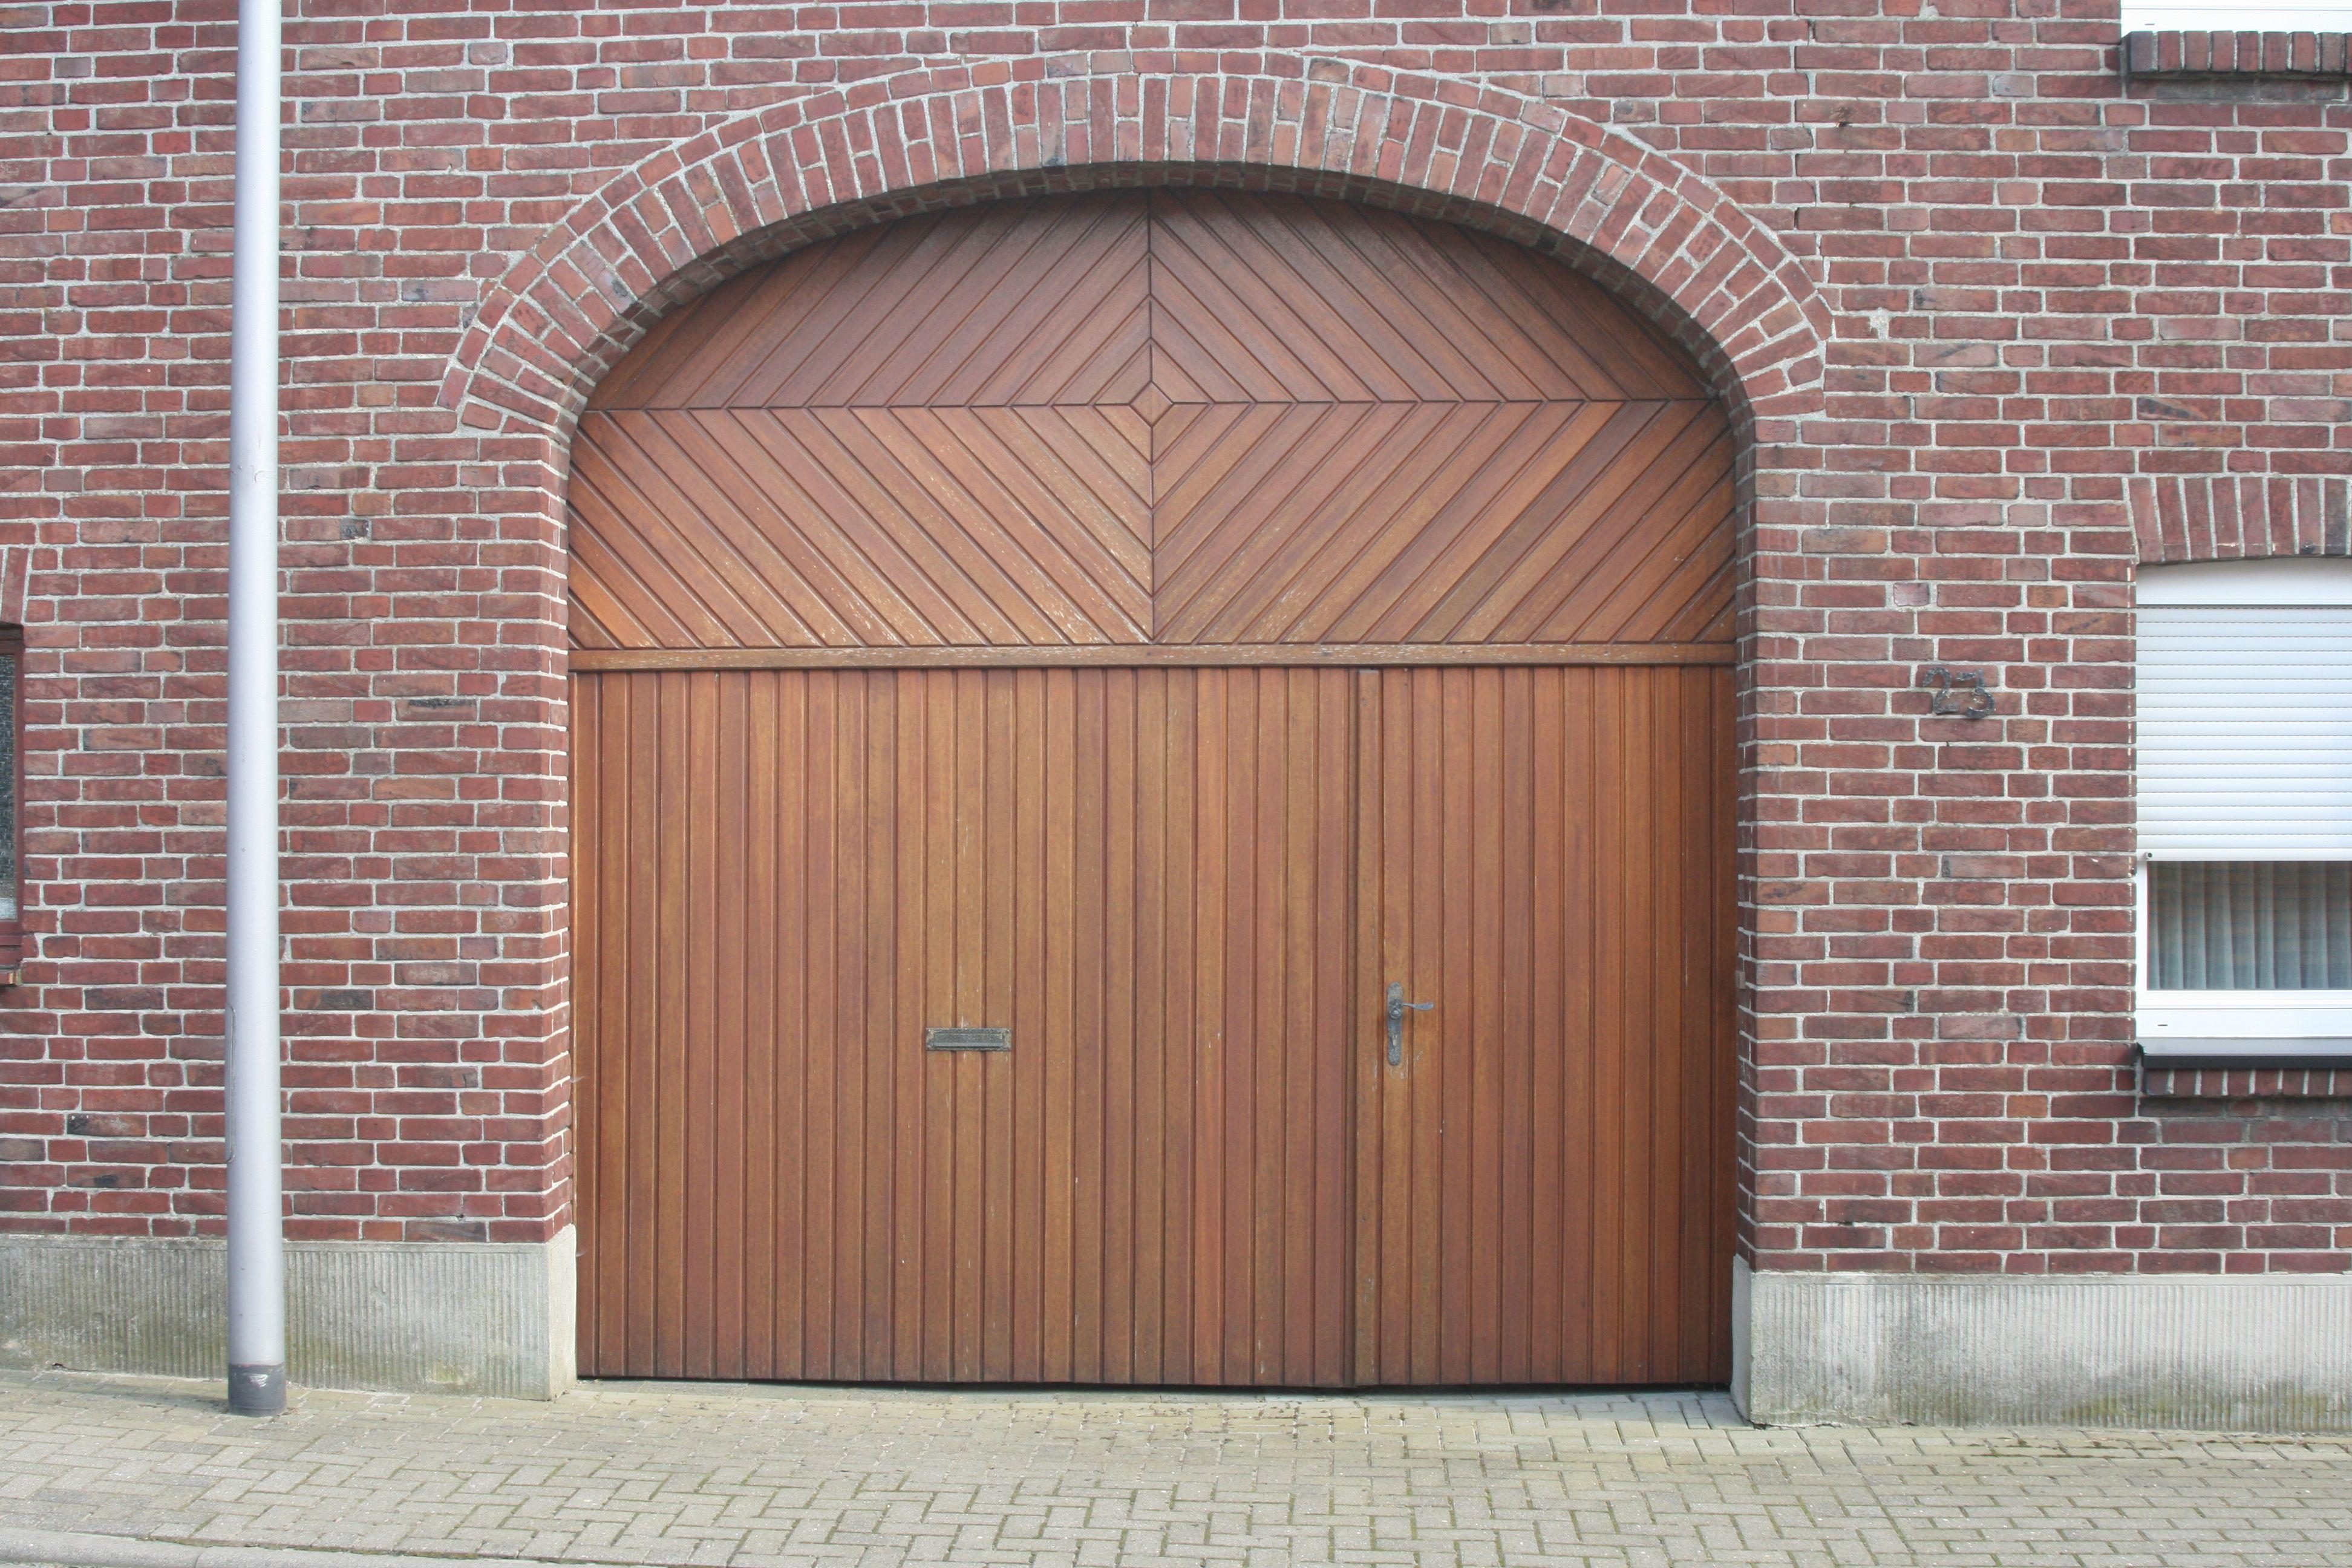 large doors - Google Search & large doors - Google Search | Large Double Doors \u0026 Door Frame ... Pezcame.Com